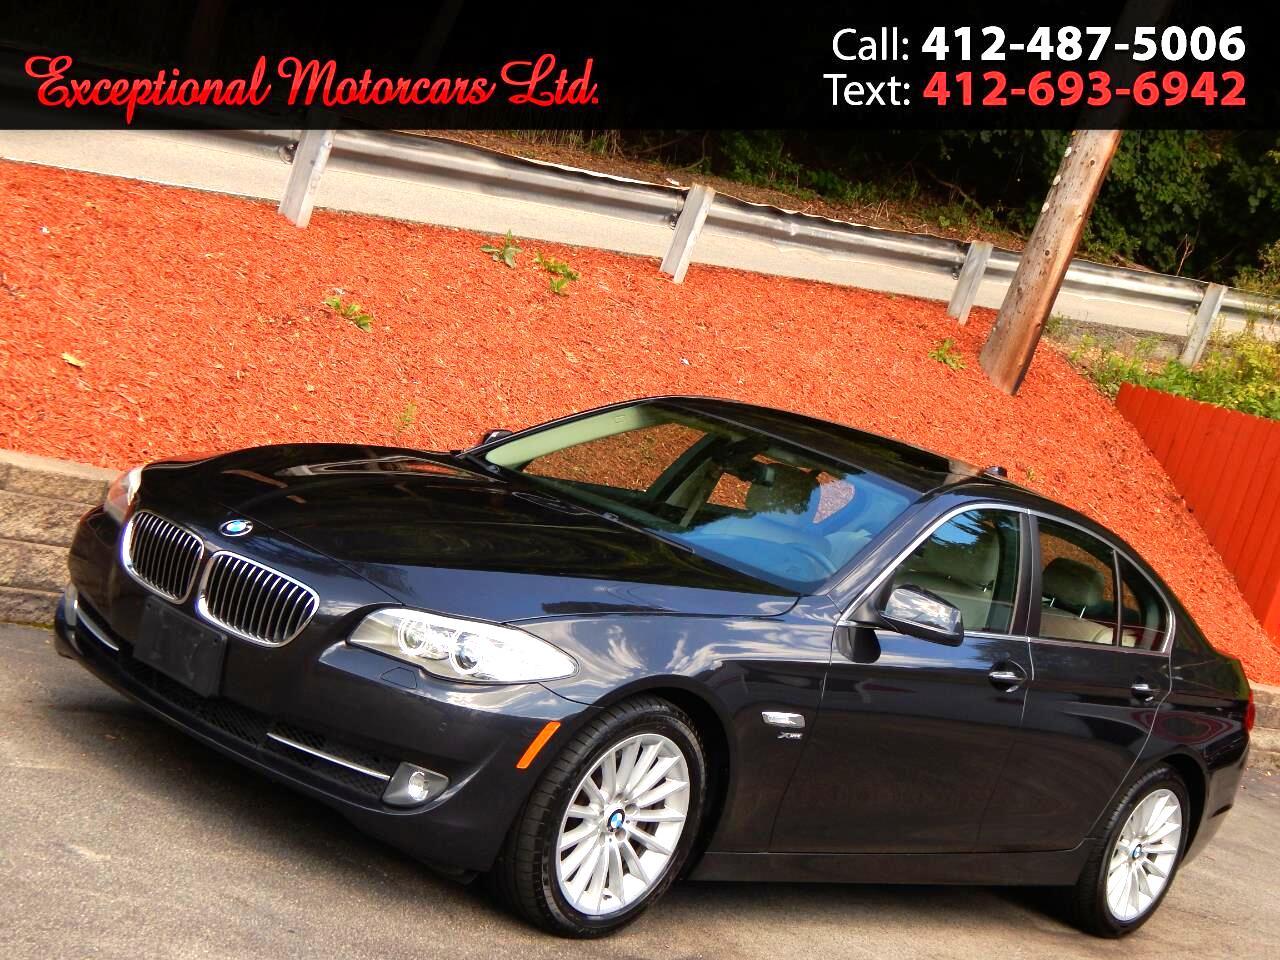 2012 BMW 5 Series 4dr Sdn 535i xDrive AWD